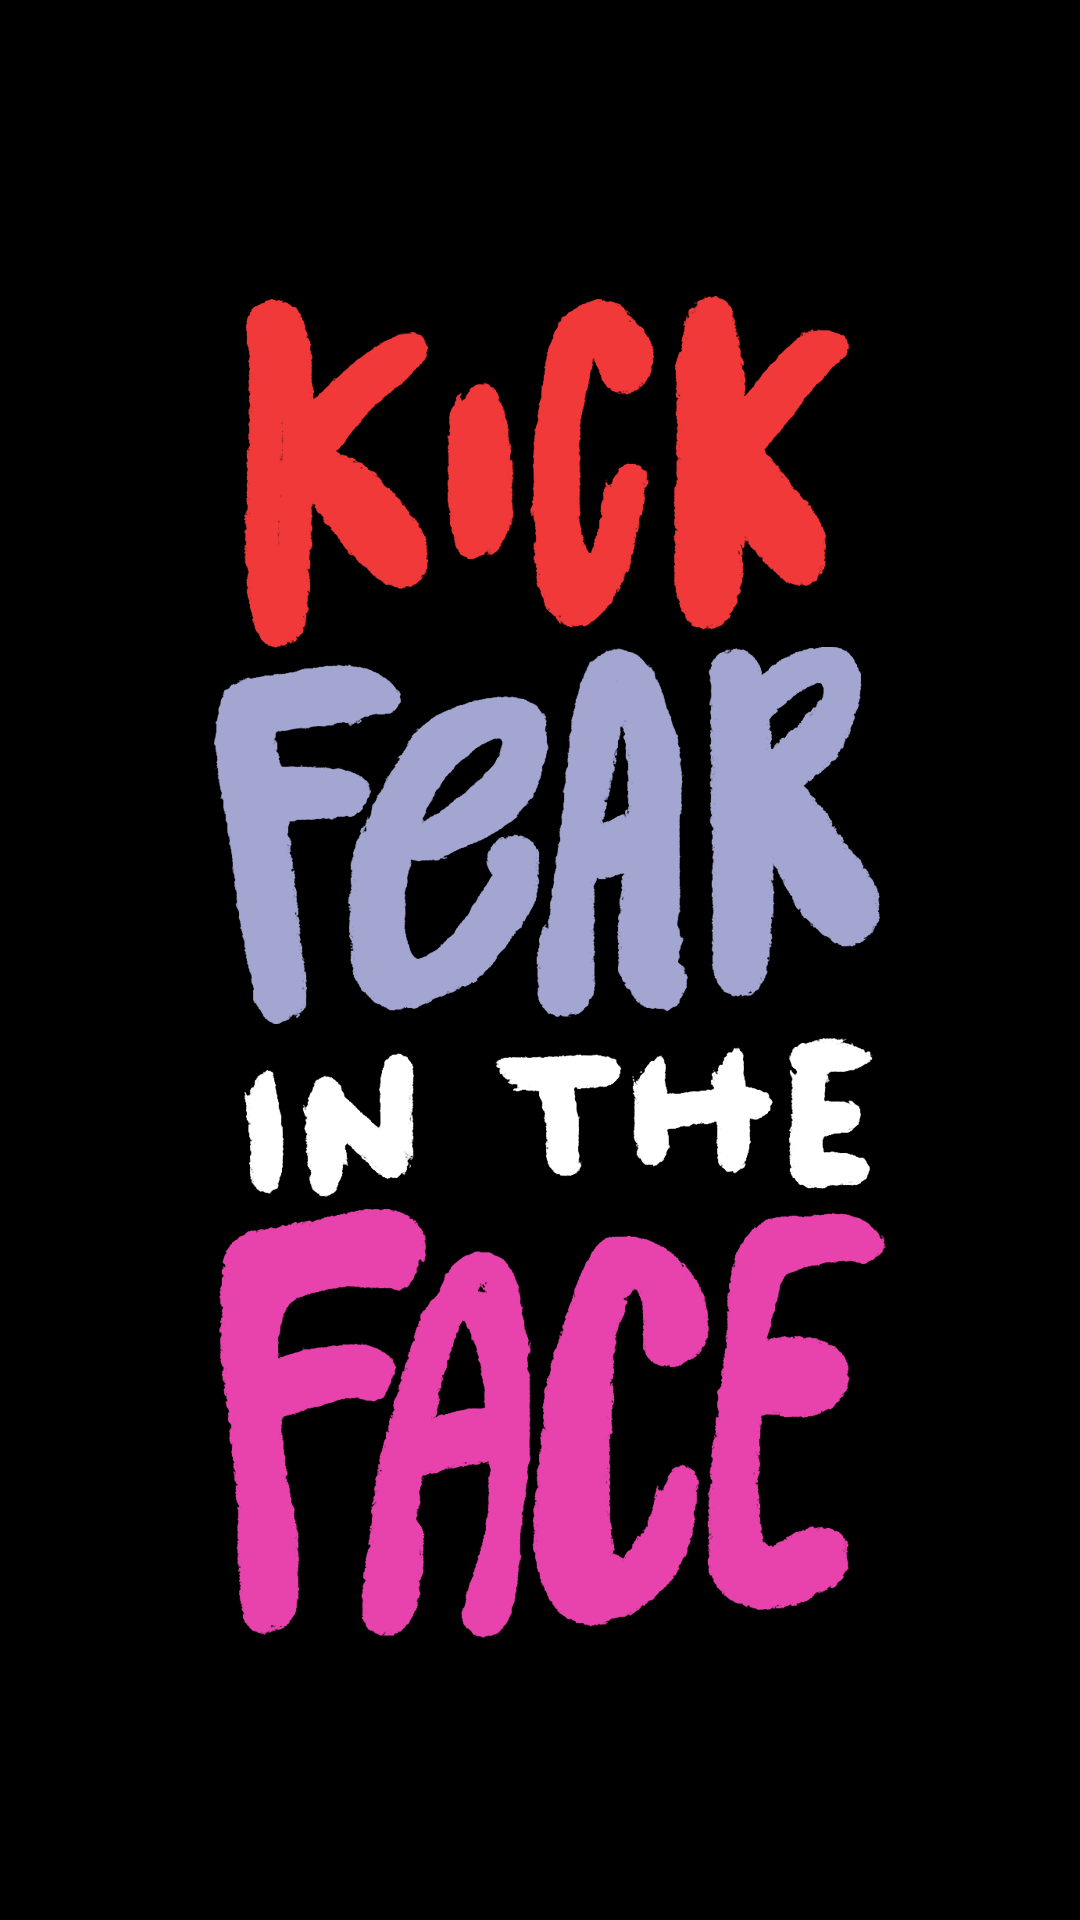 even-vanity-ends-kick-fear-blk.png